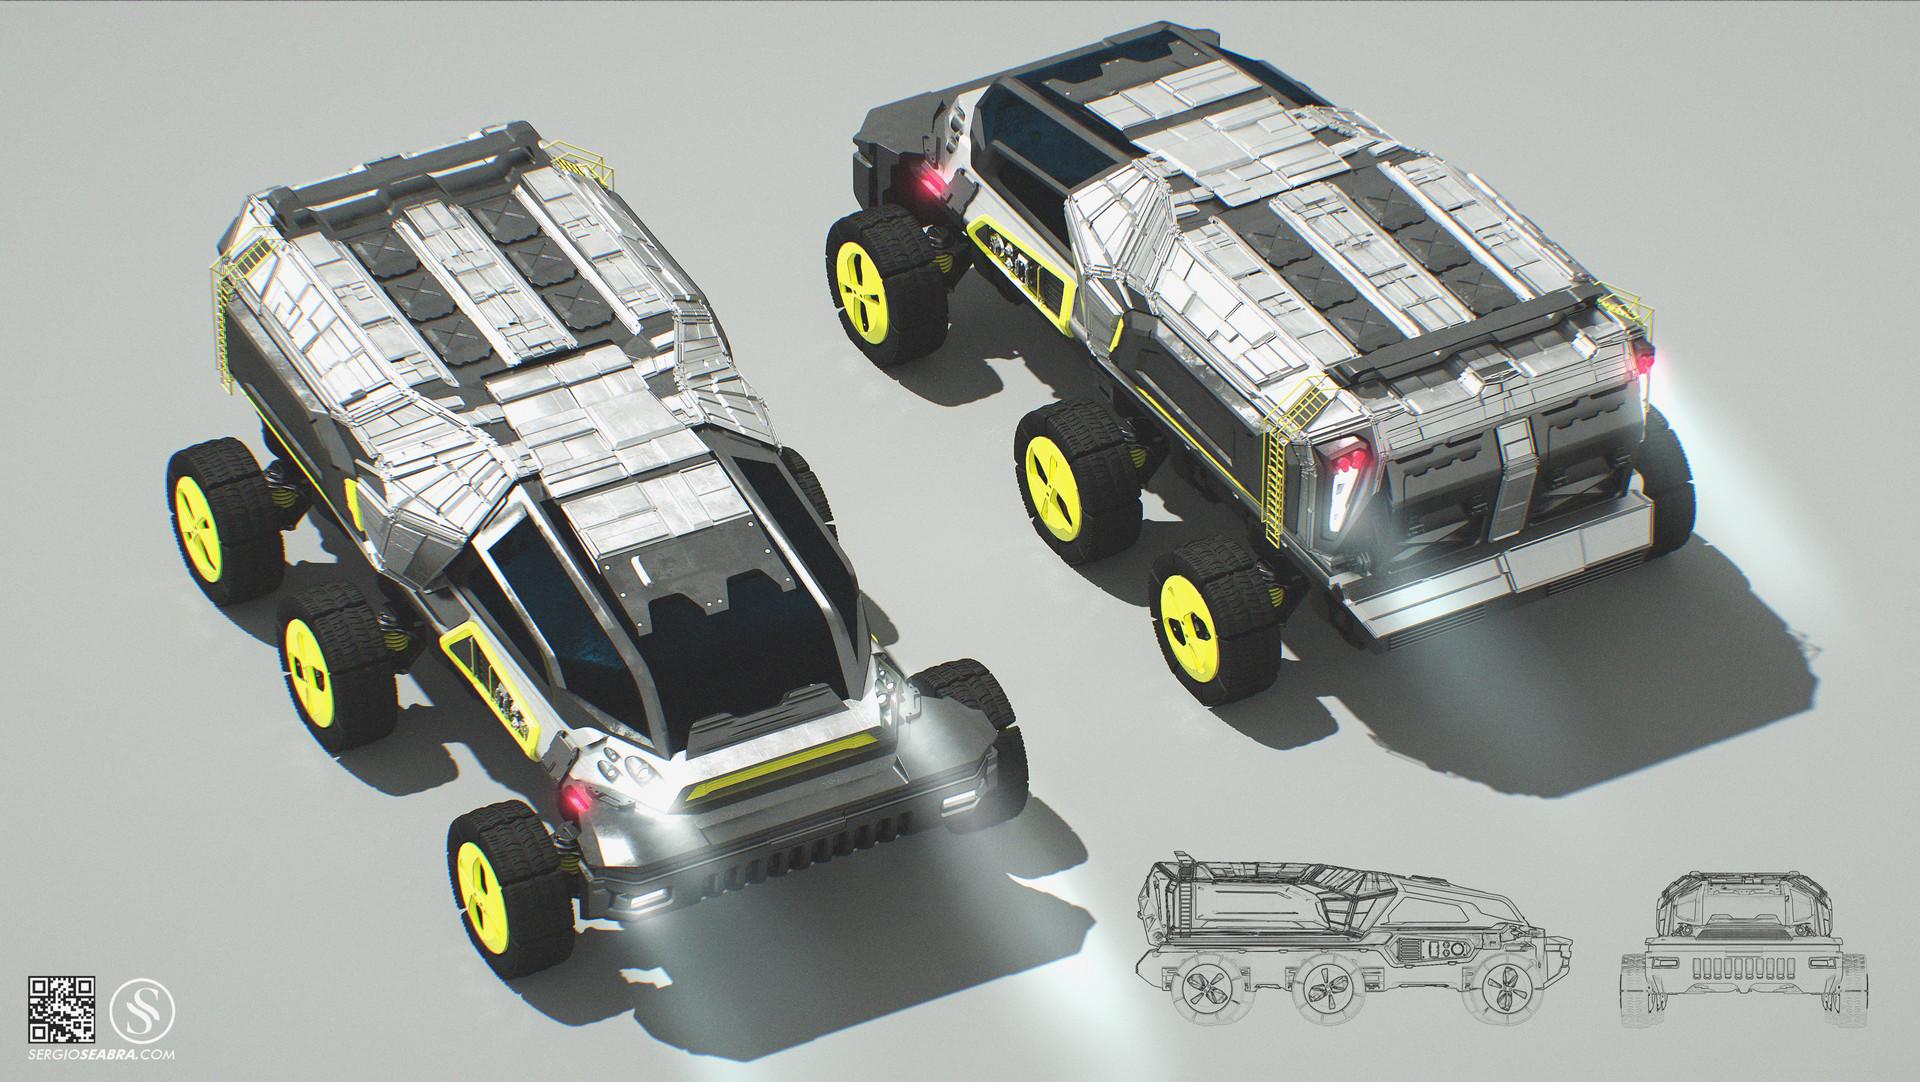 Sergio seabra 201810 veh mars rover layout2 ss